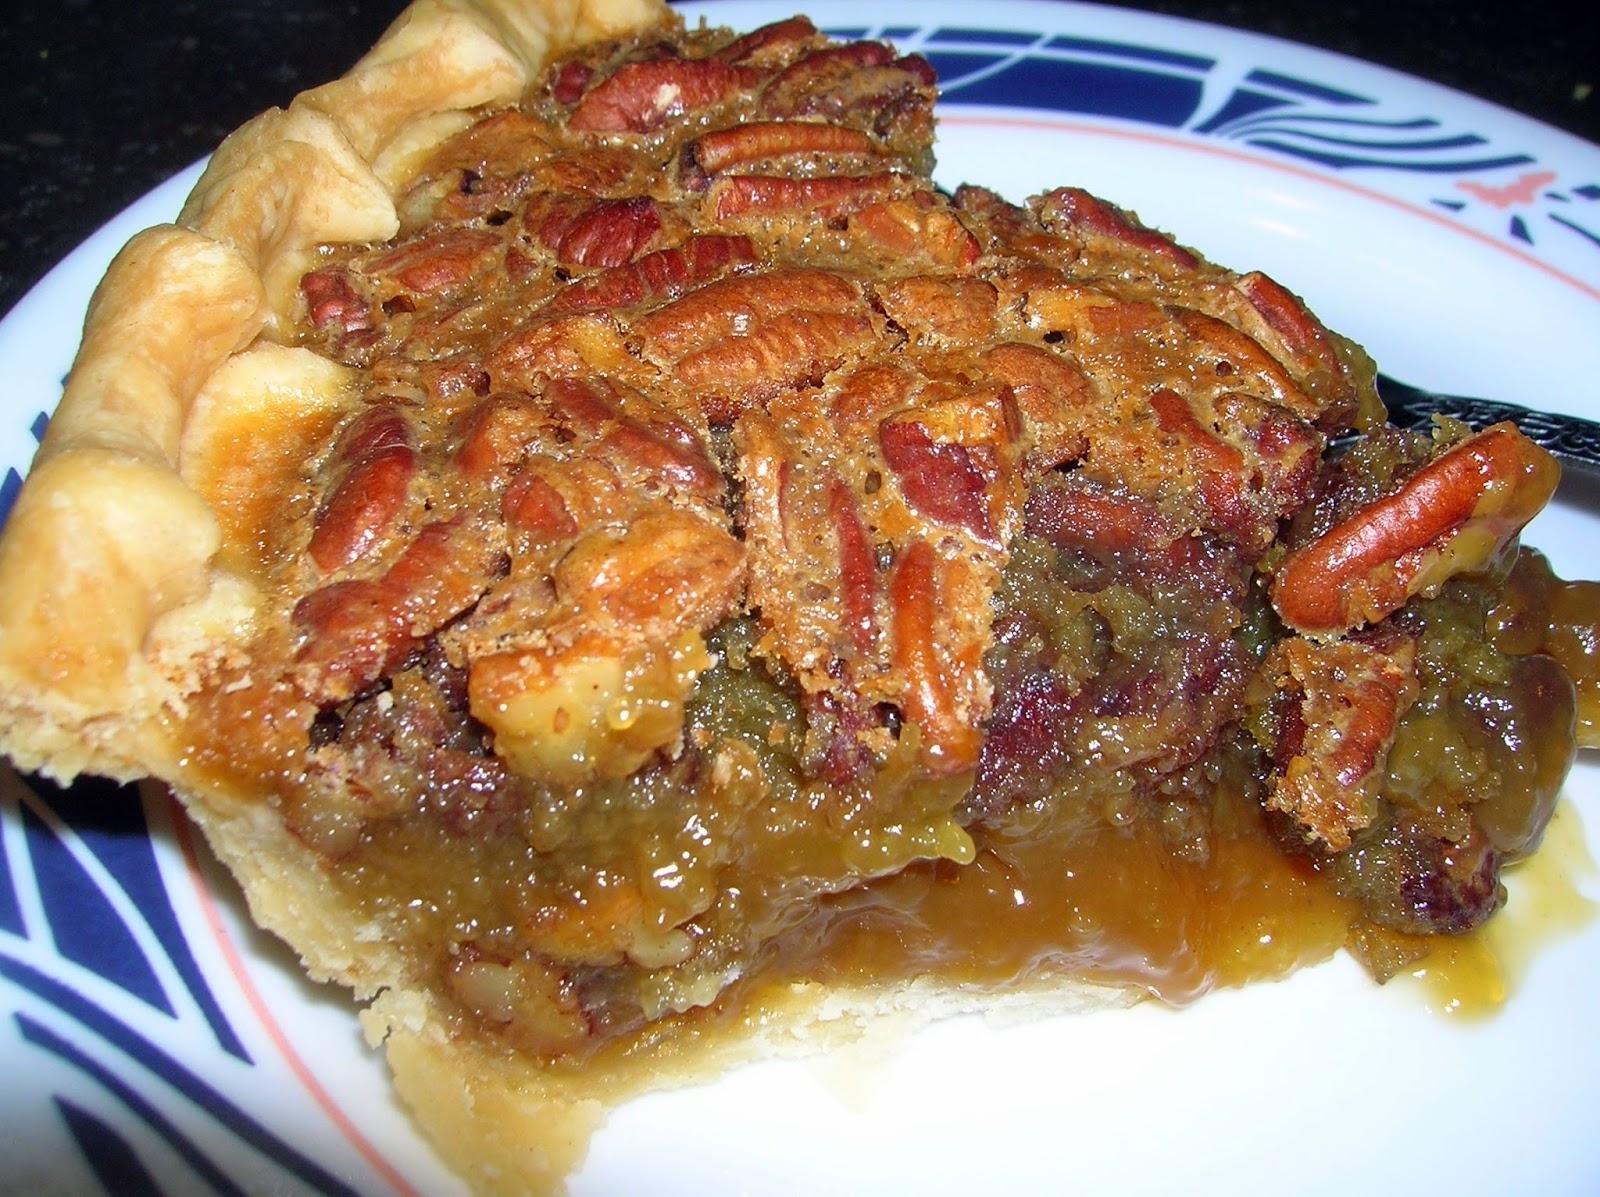 http://cookingitaliancomfortfood.com/2012/03/25/old-fashioned-pecan-pie/